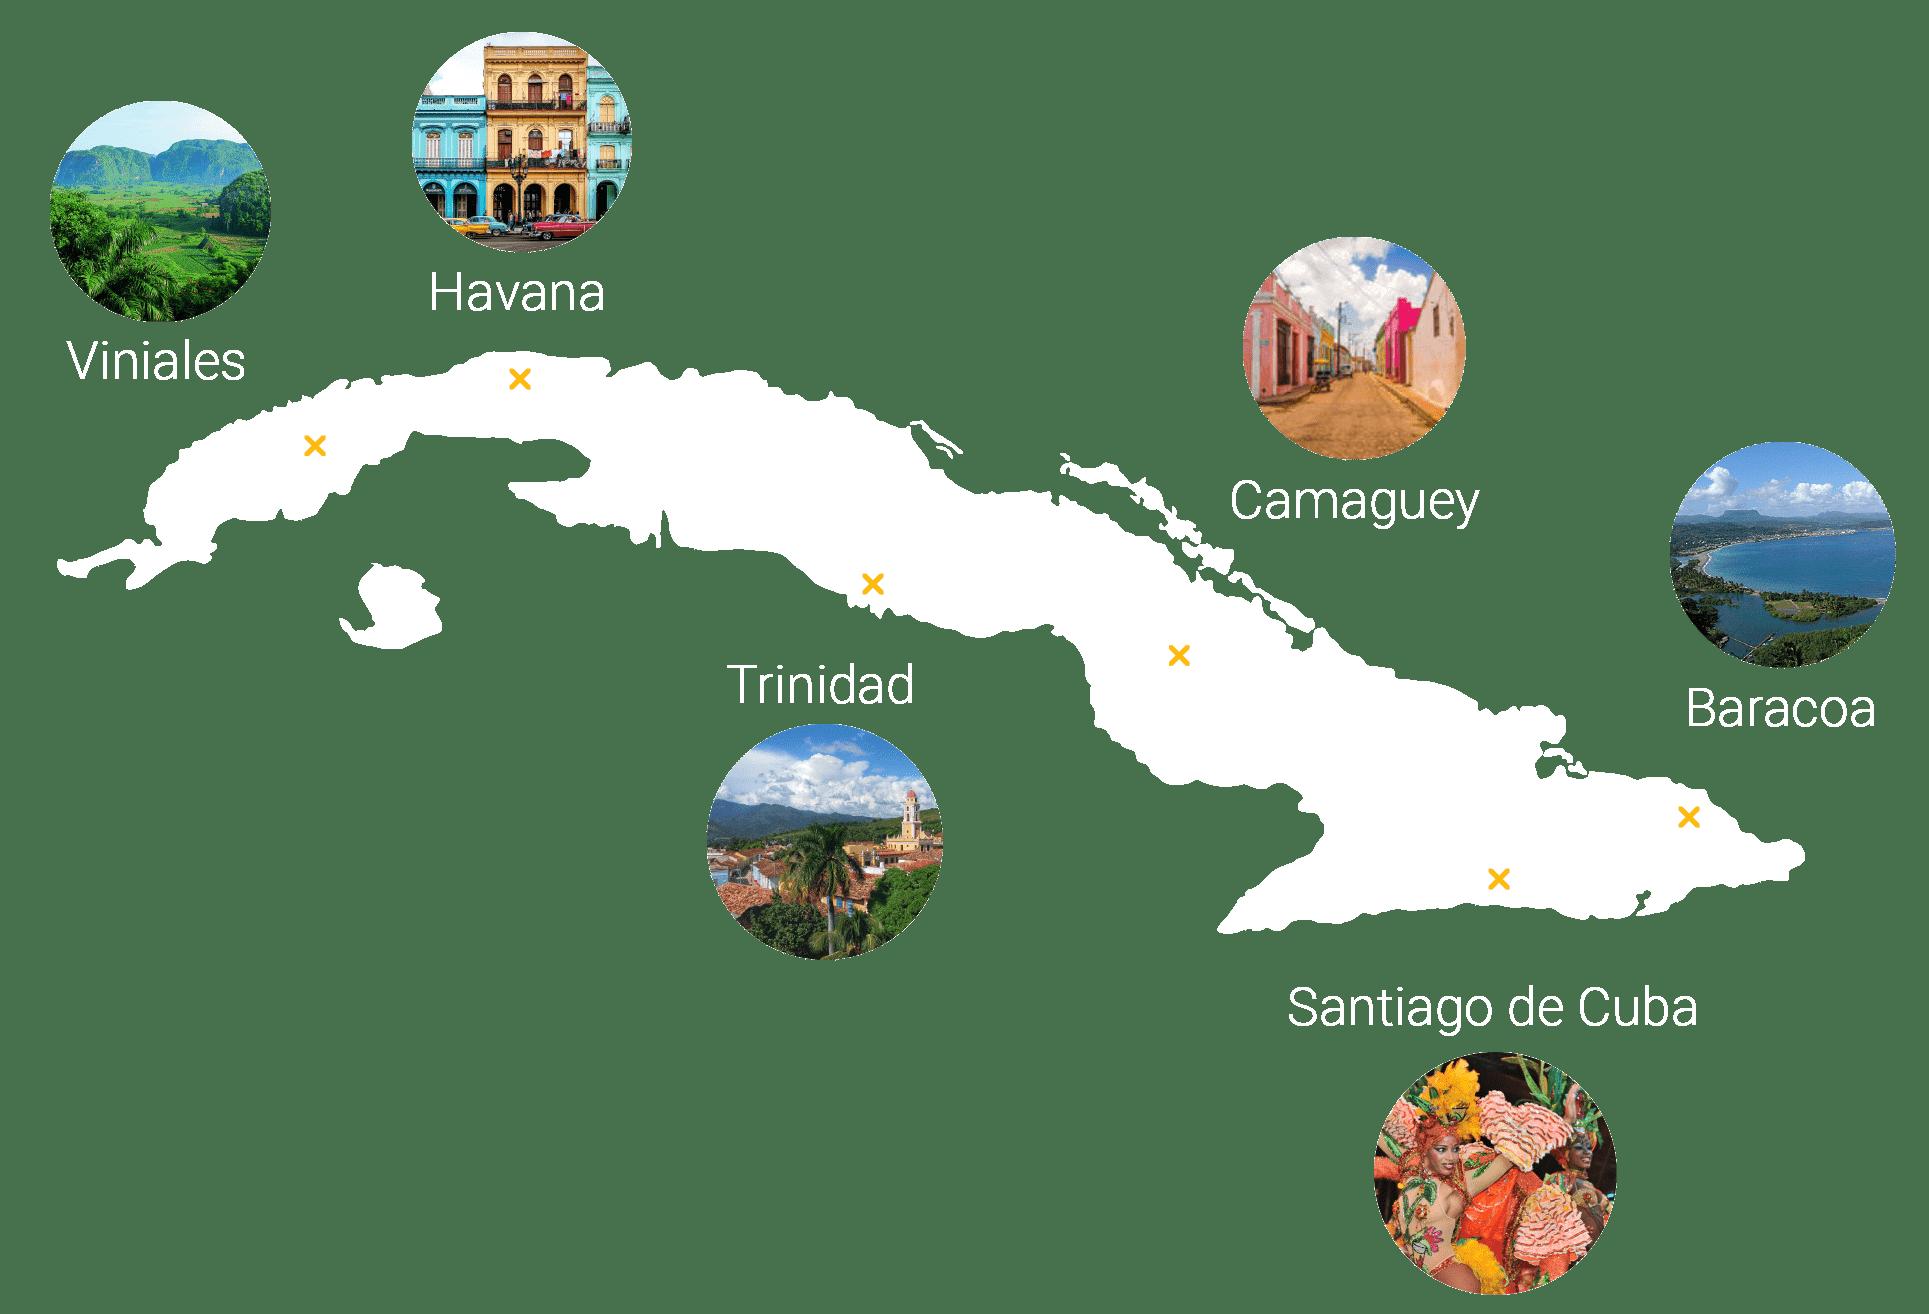 Skydream Cuba Tours departure points shown in Cuba map